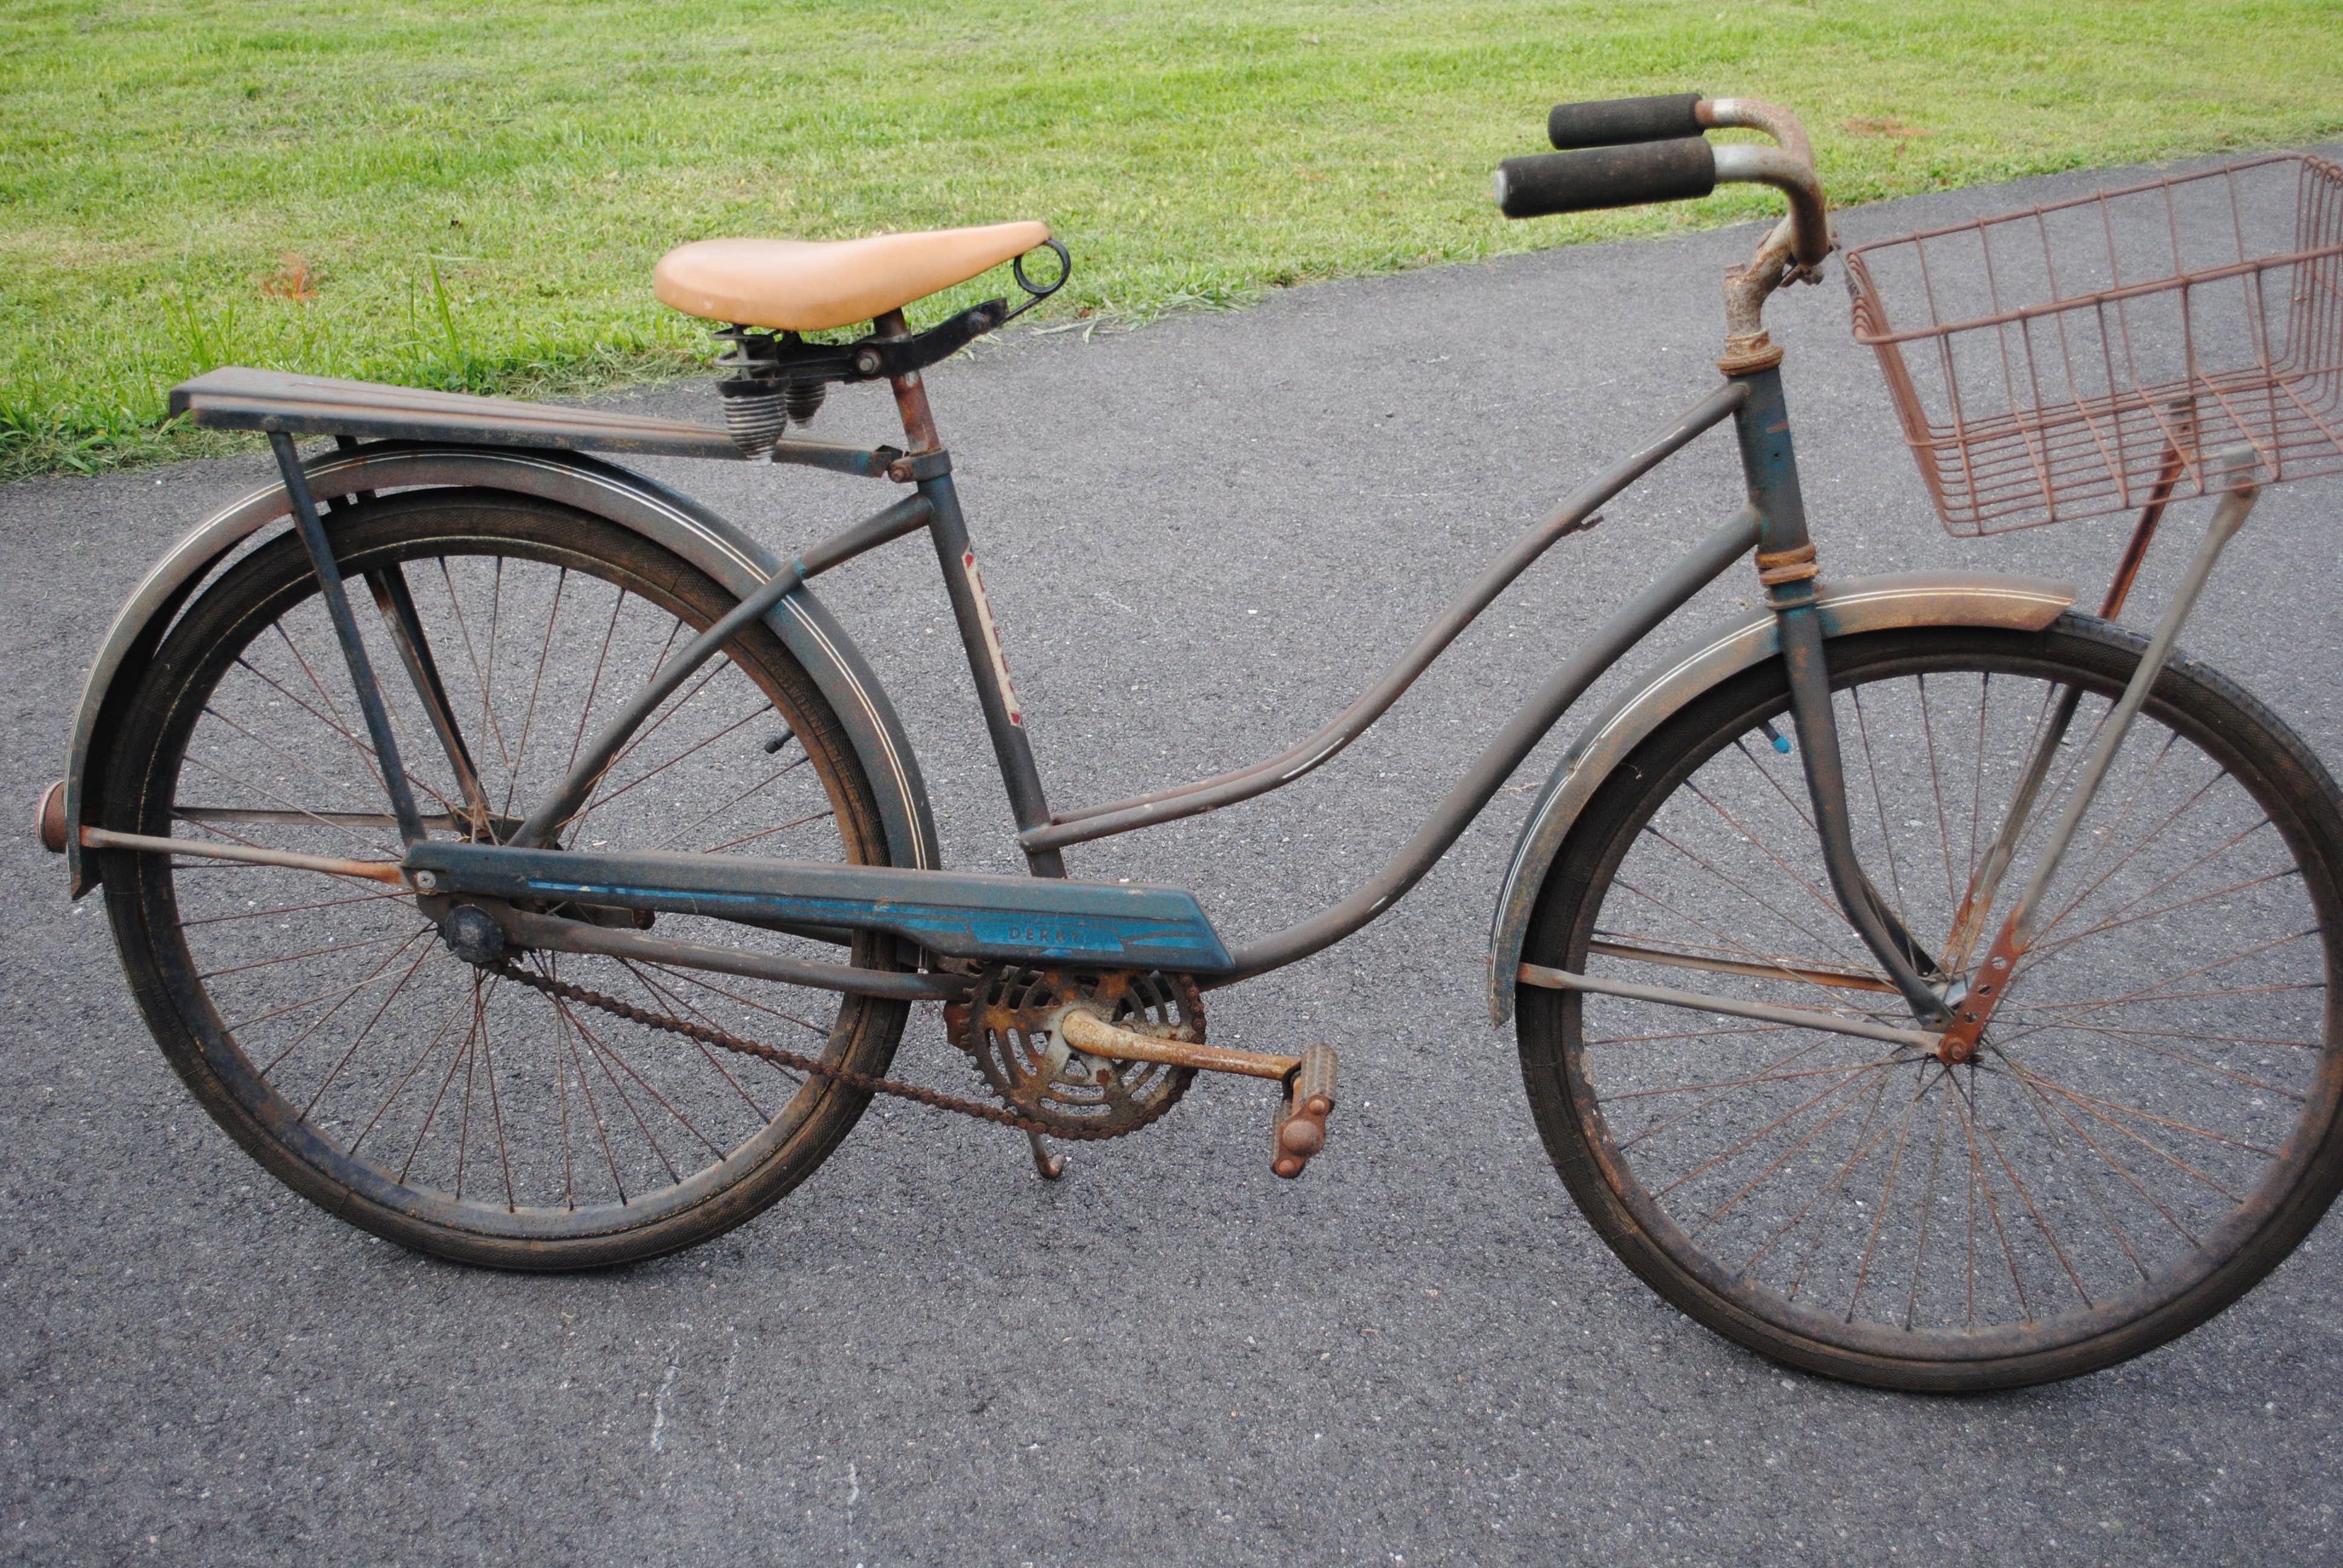 Derby girls bike all original with basket on Craigslist